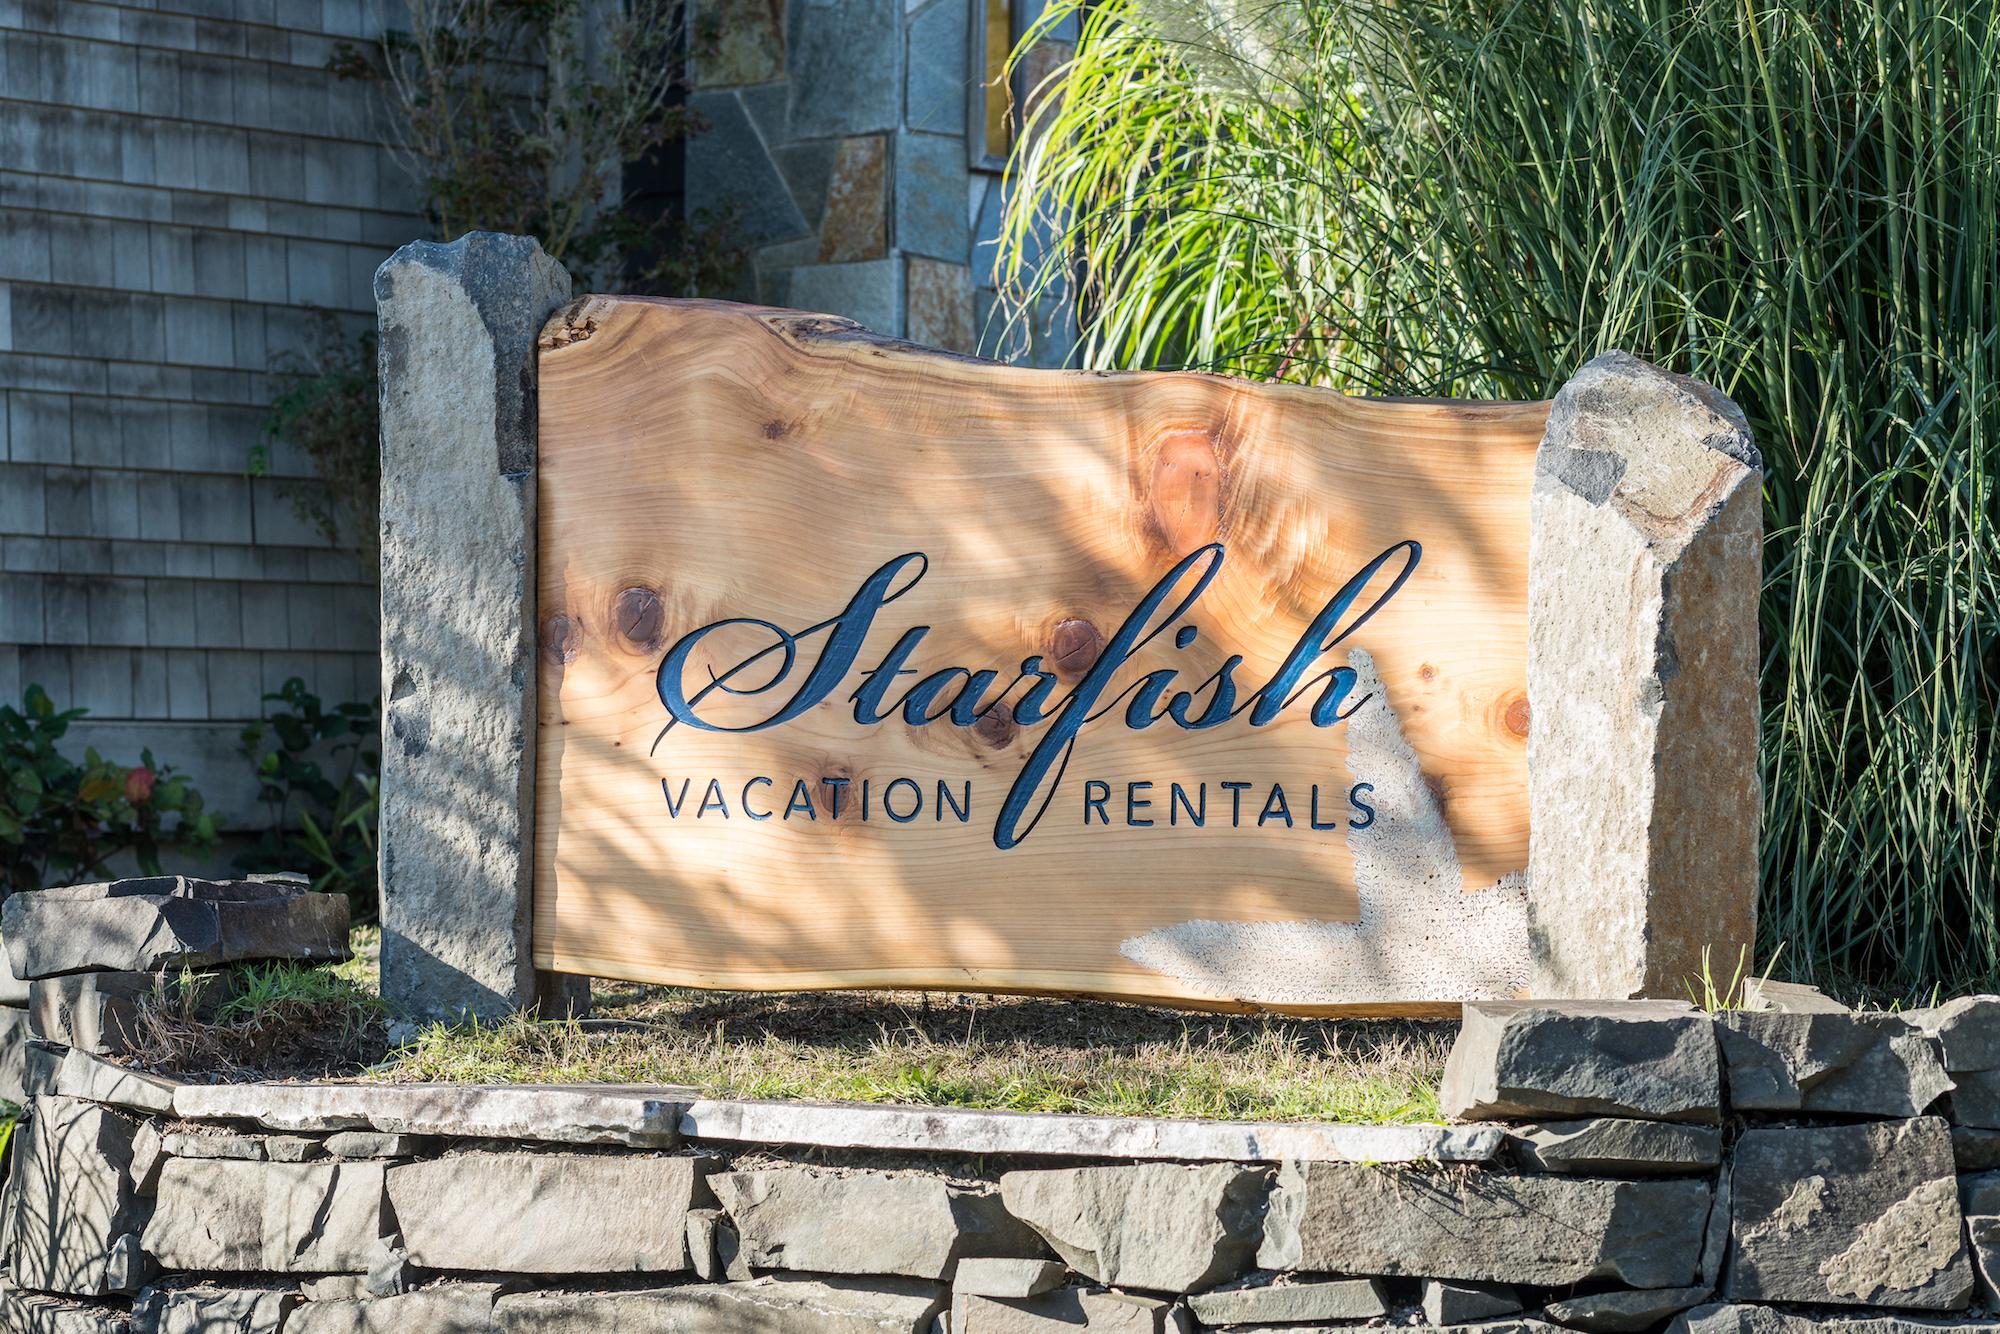 Starfish Vacation Rentals outdoor sign